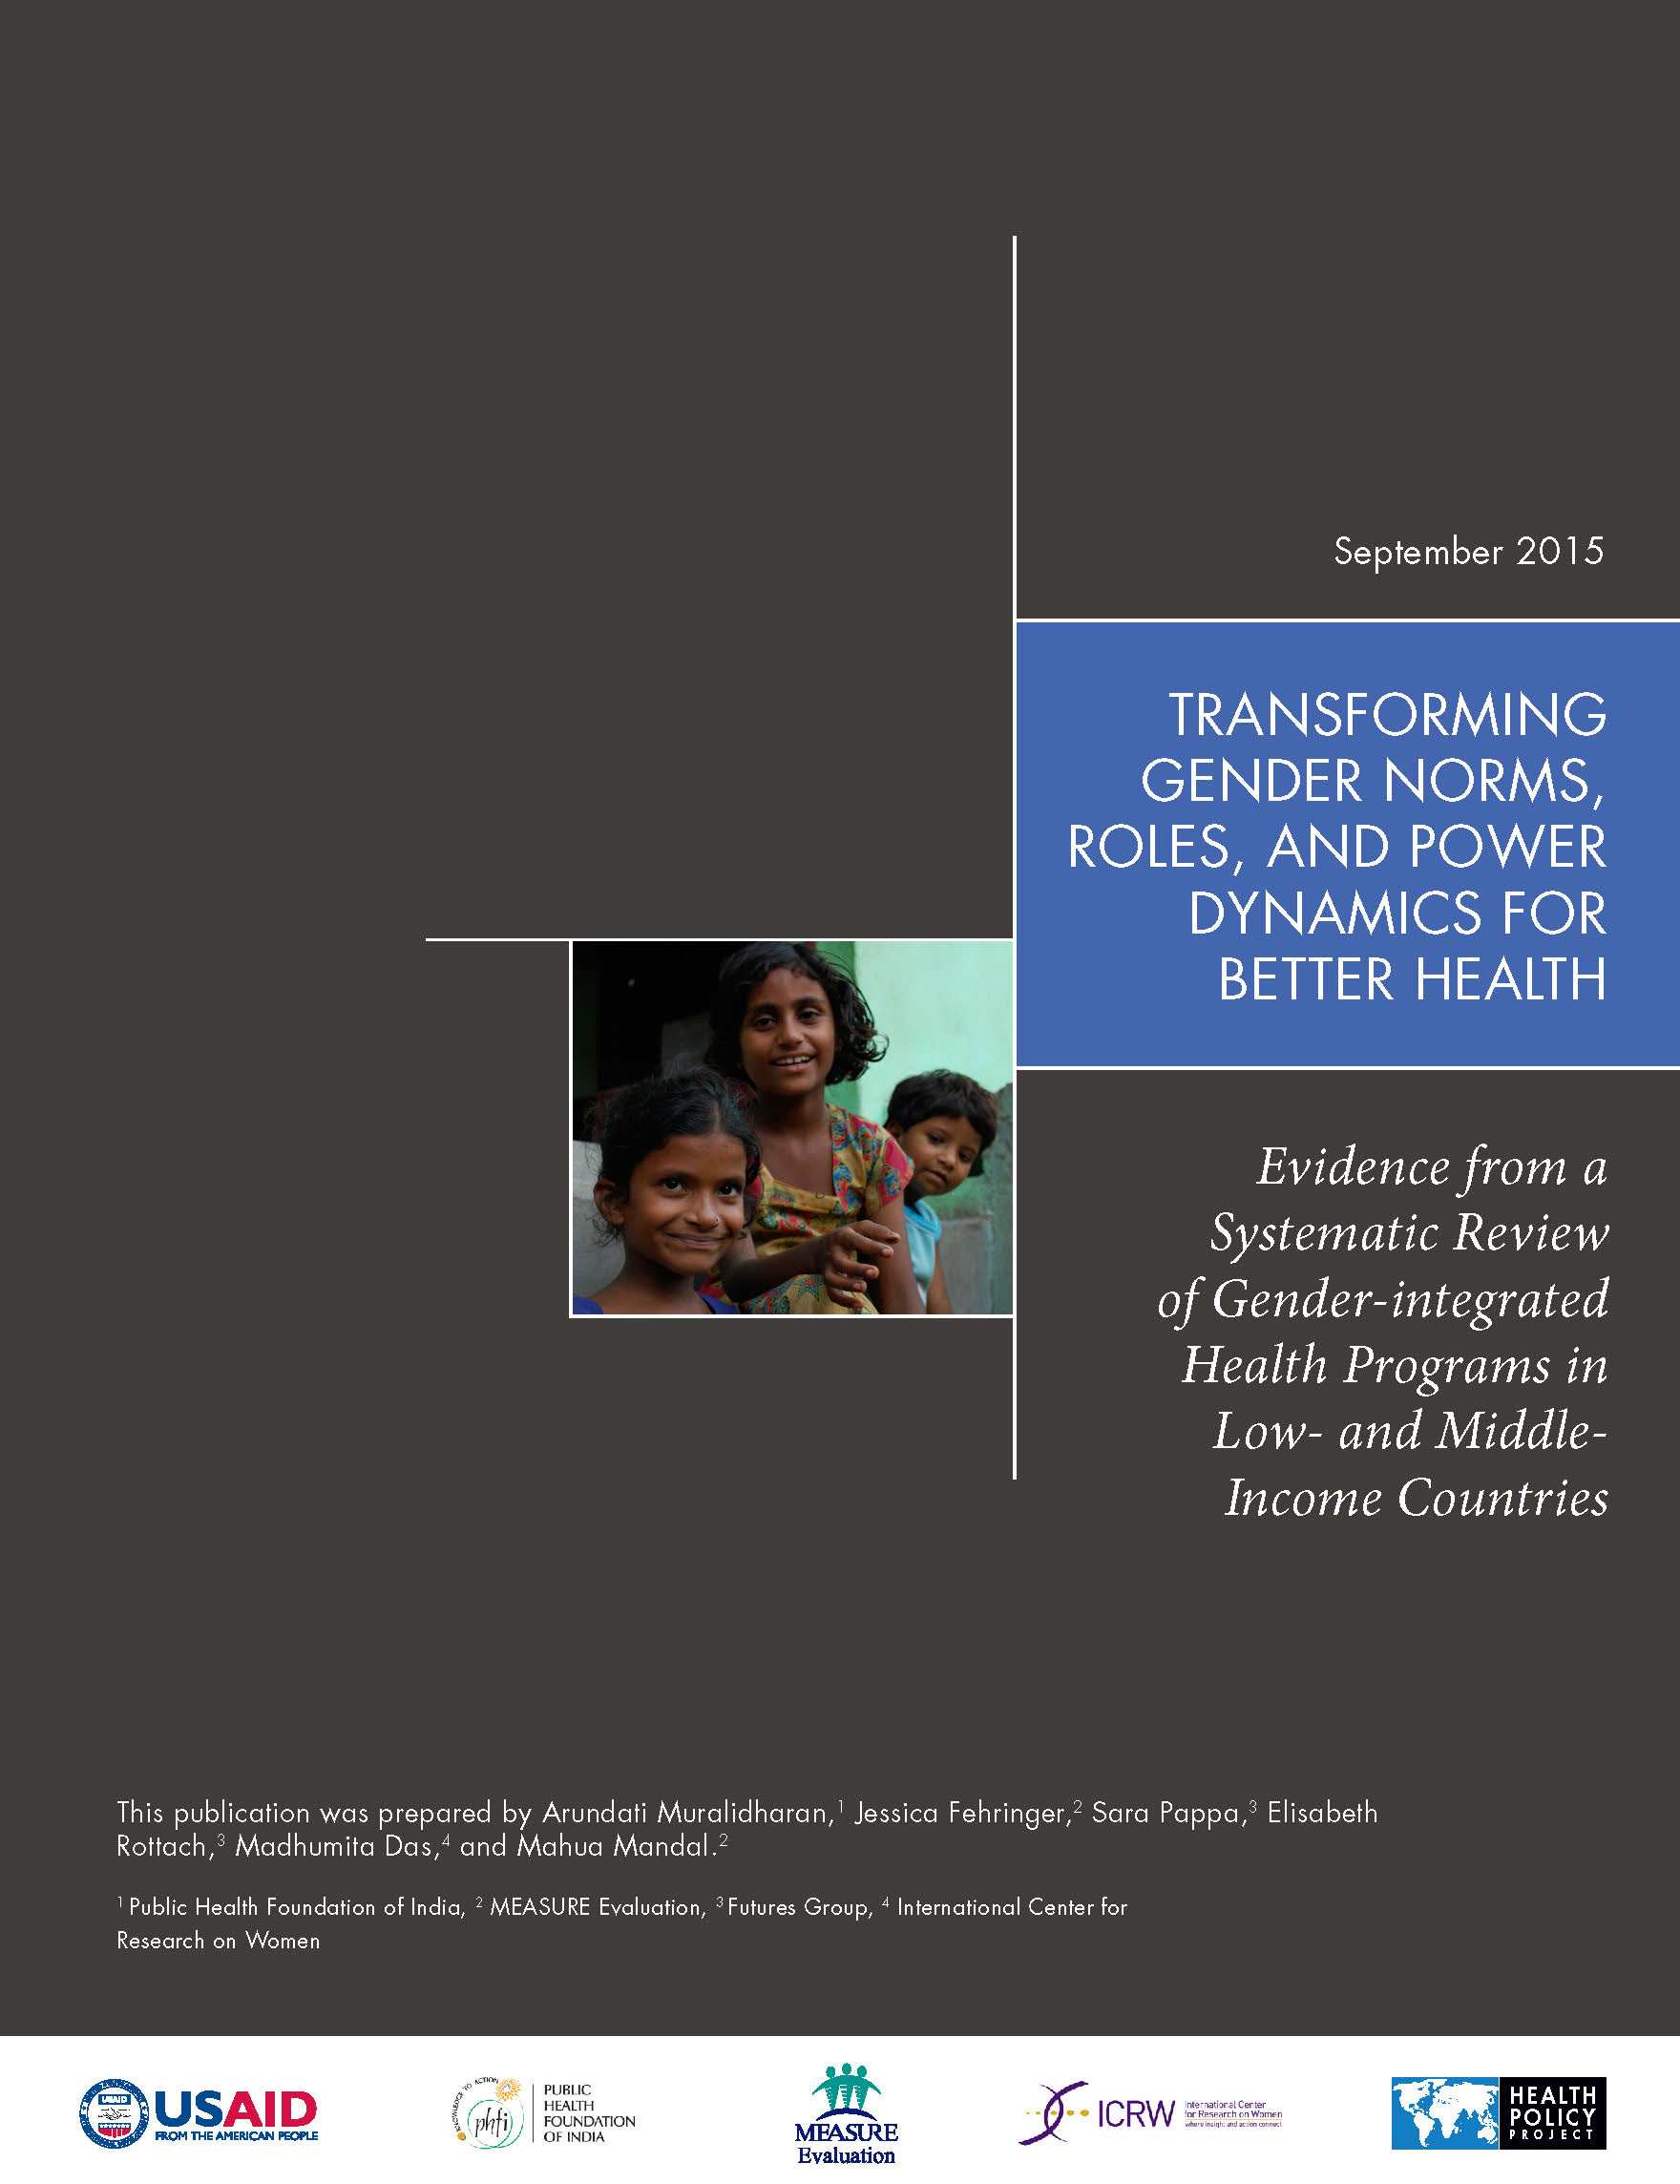 Transforming Gender Norms